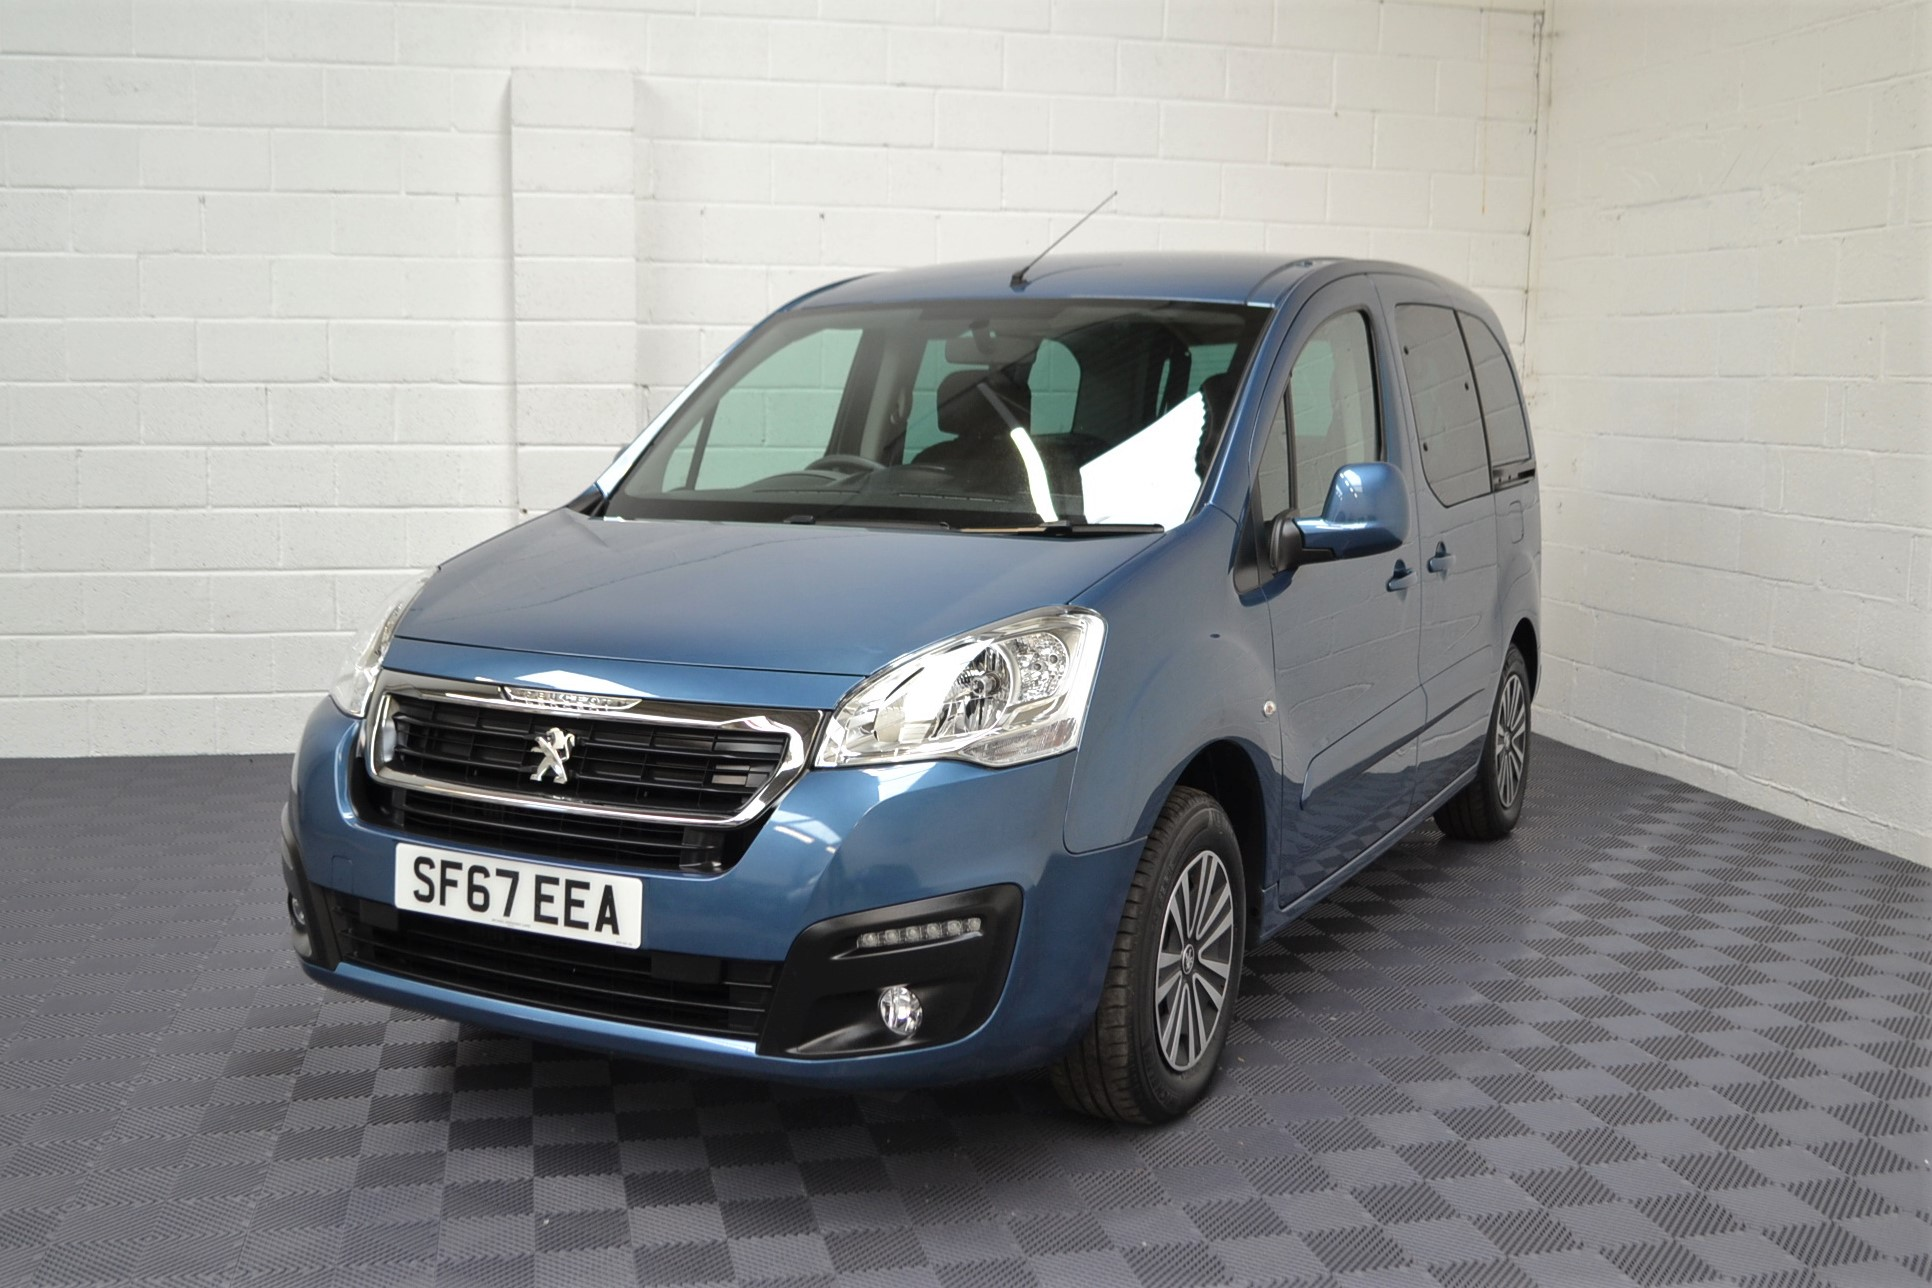 WAV Cars For Sale Bristol Wheelchair Accessible Vehicles Used For Sale Somerset Devon Dorset Bath Peugeot Partner SF67 EEA 21